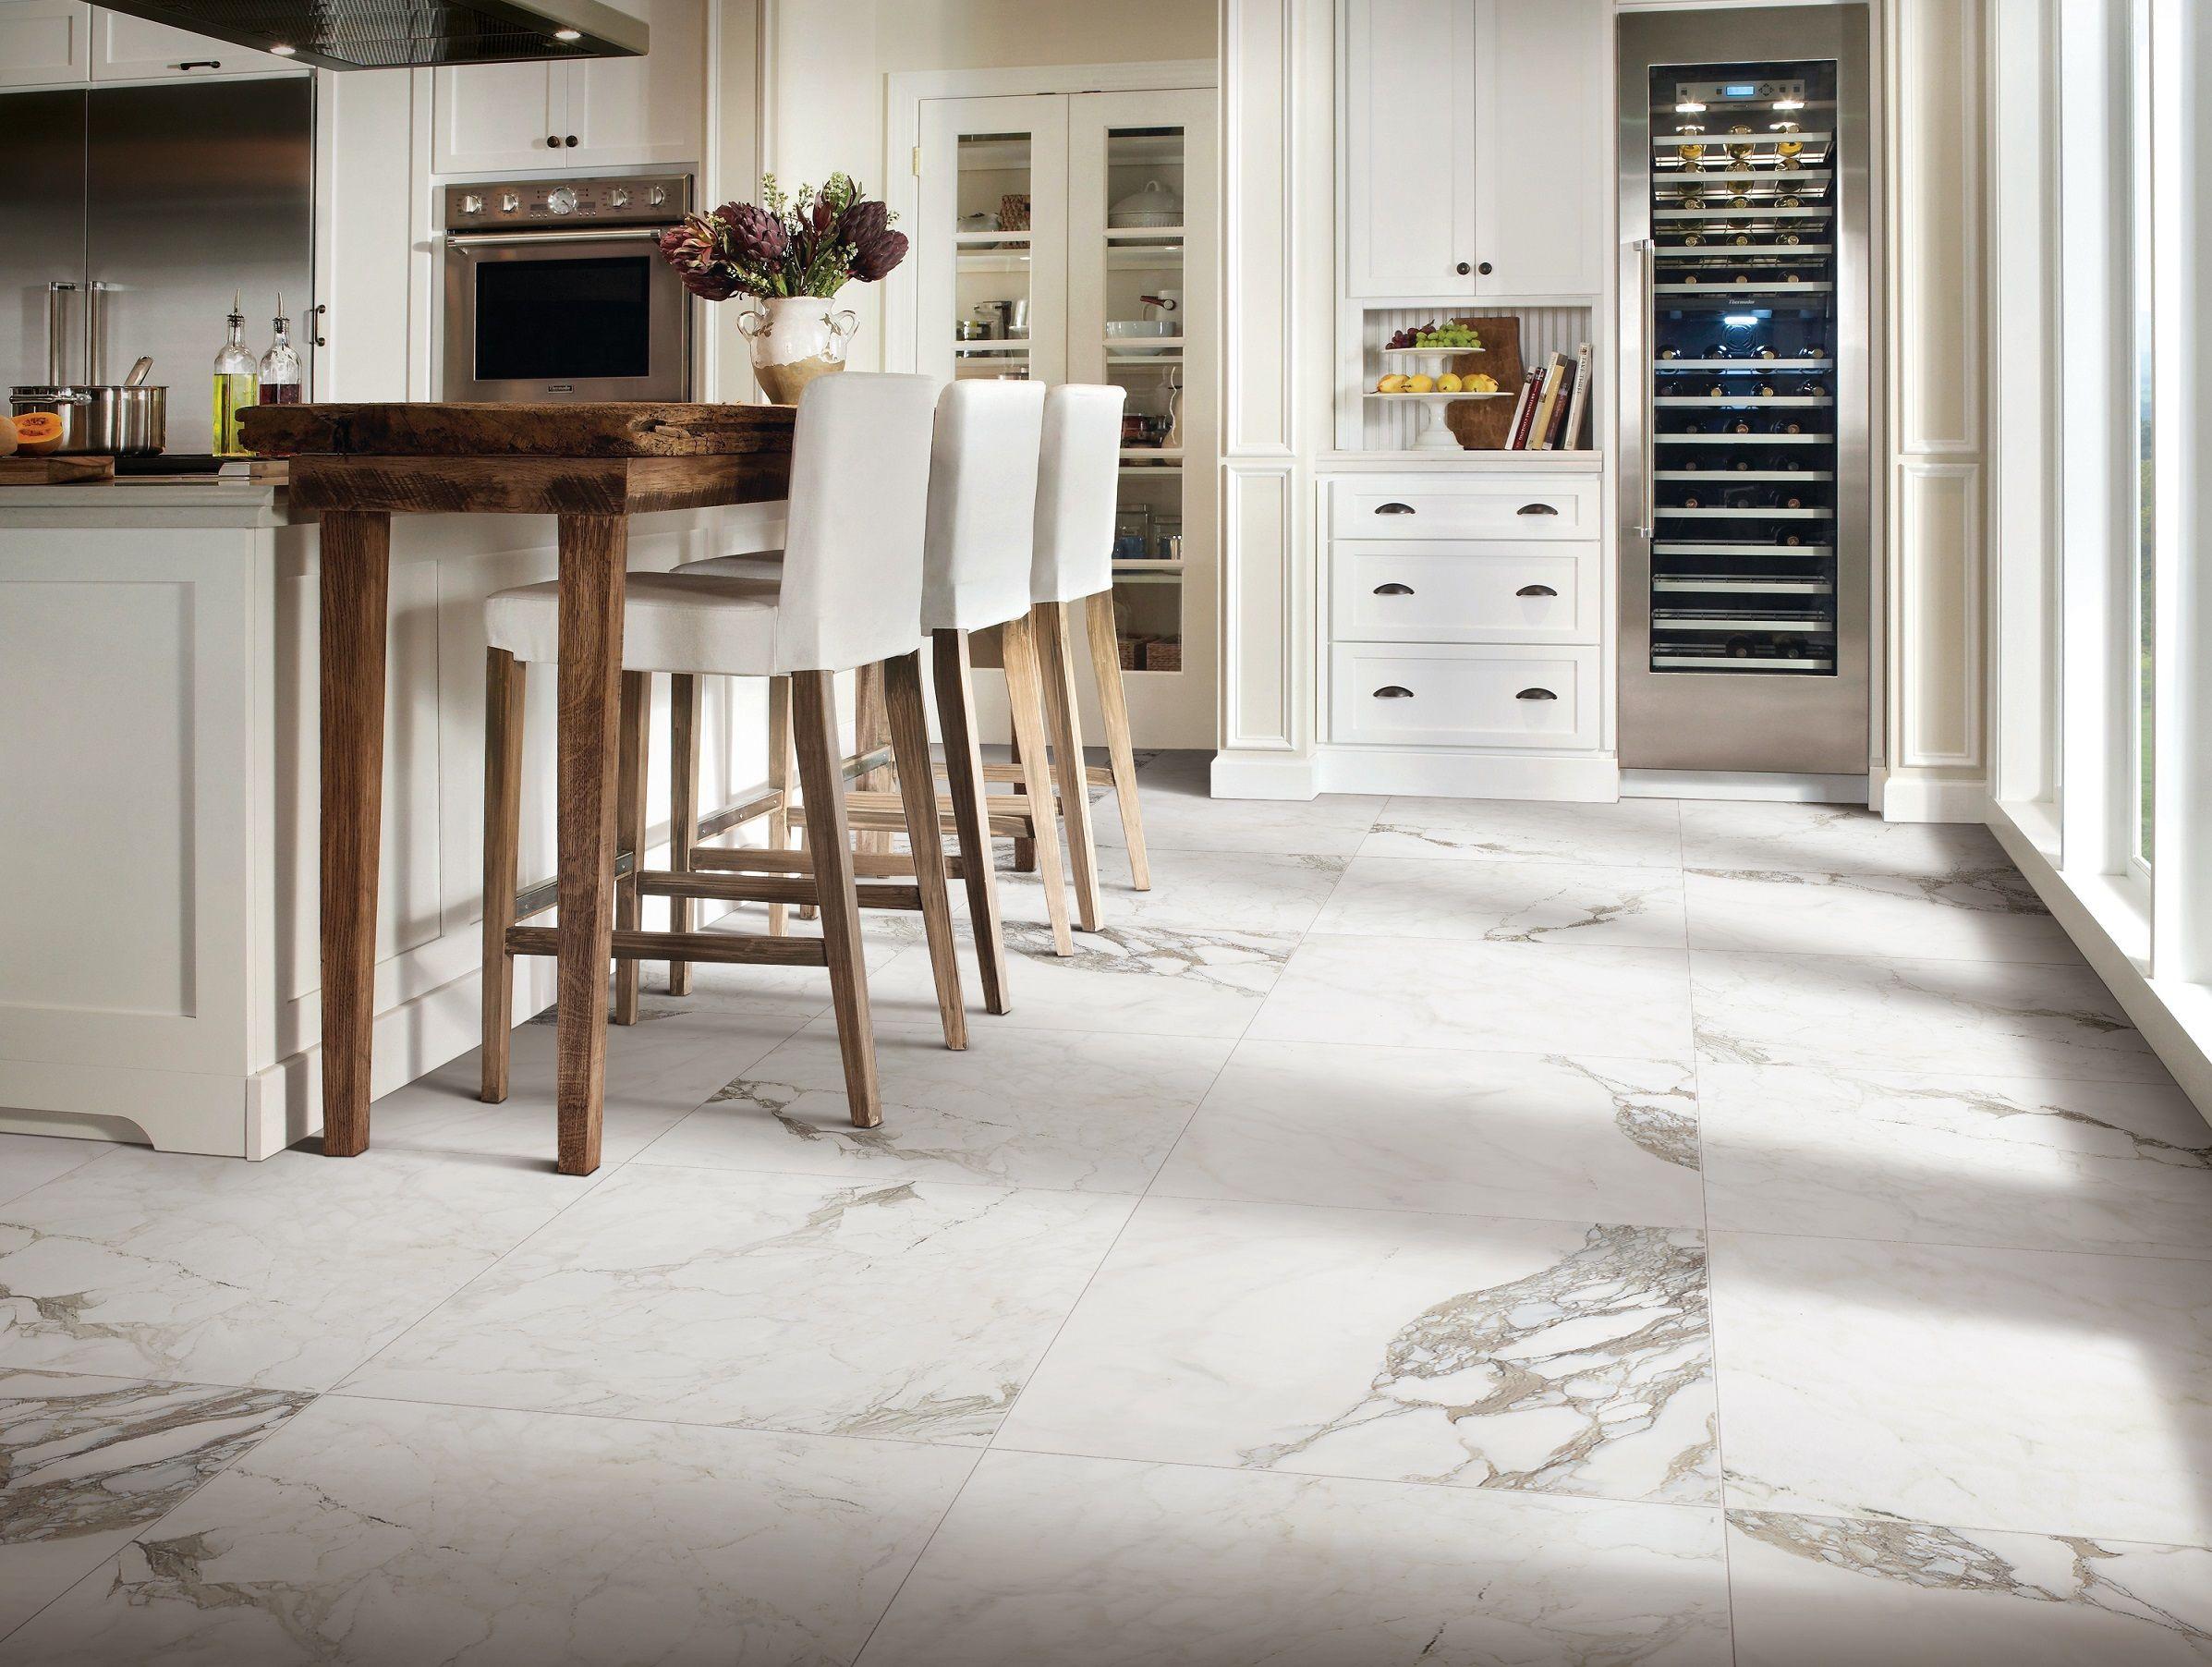 Florim Italian Large Format Tiles and Porcelain Slabs for ...